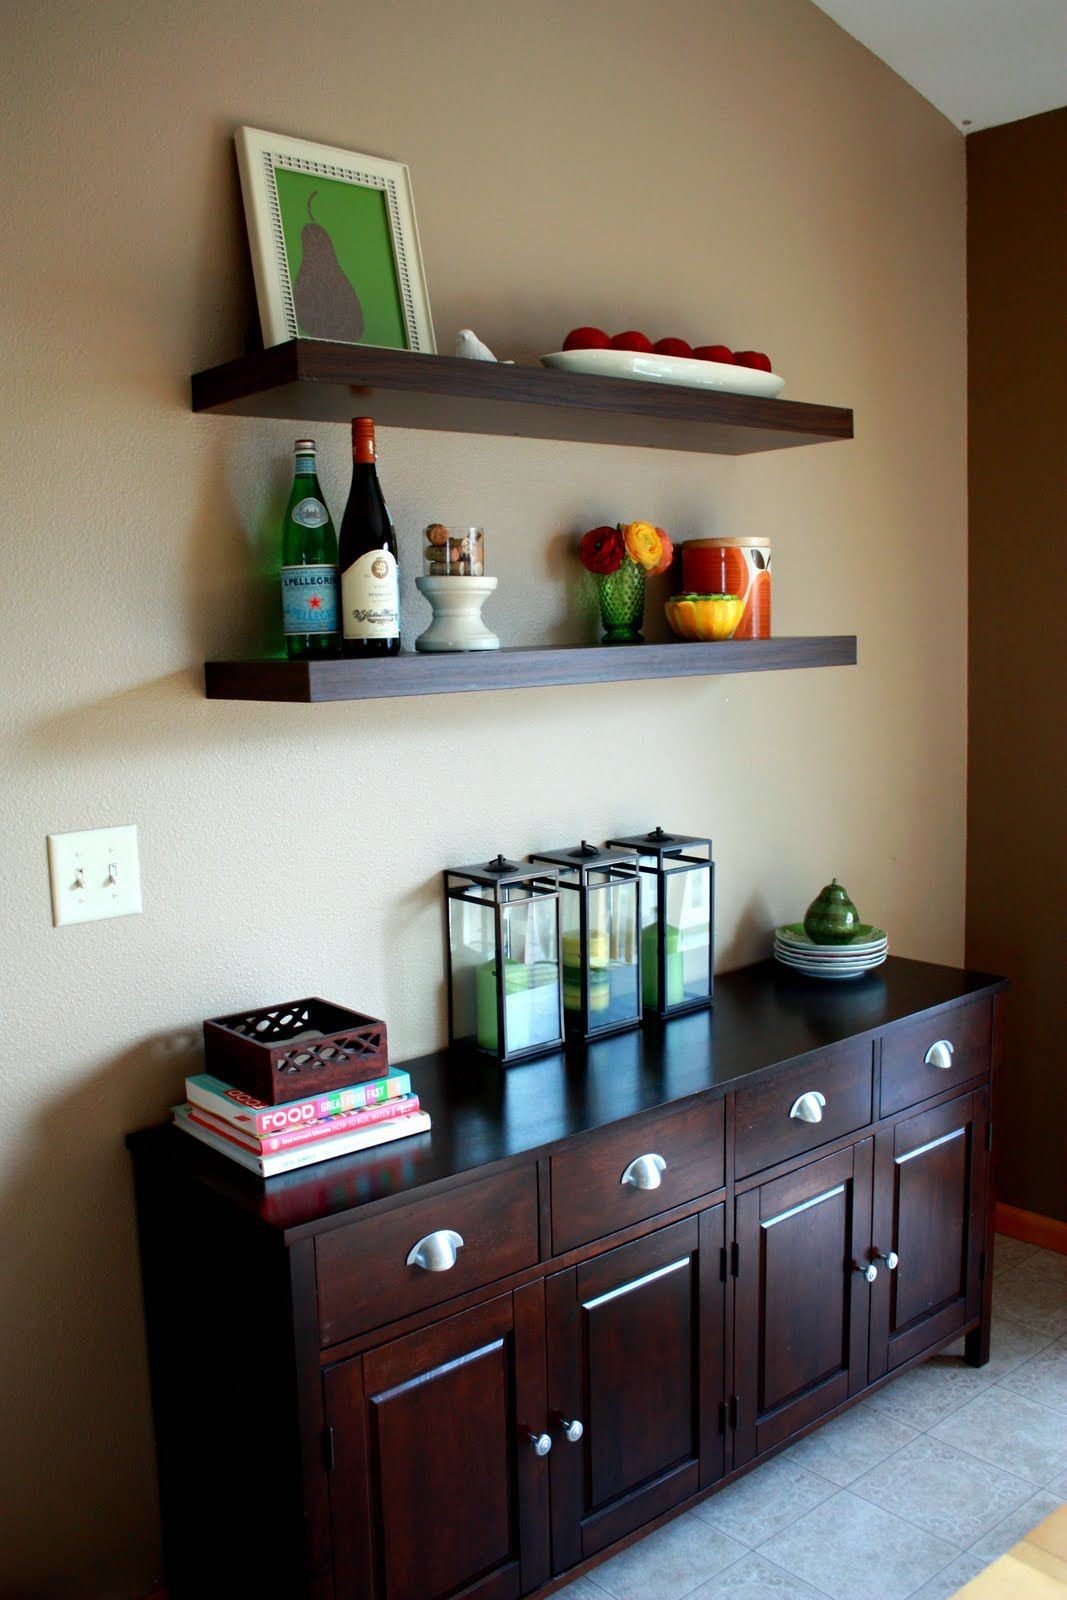 Shelves In The Living Room: LACK Floating Shelves For Living Room And Master Bedroom